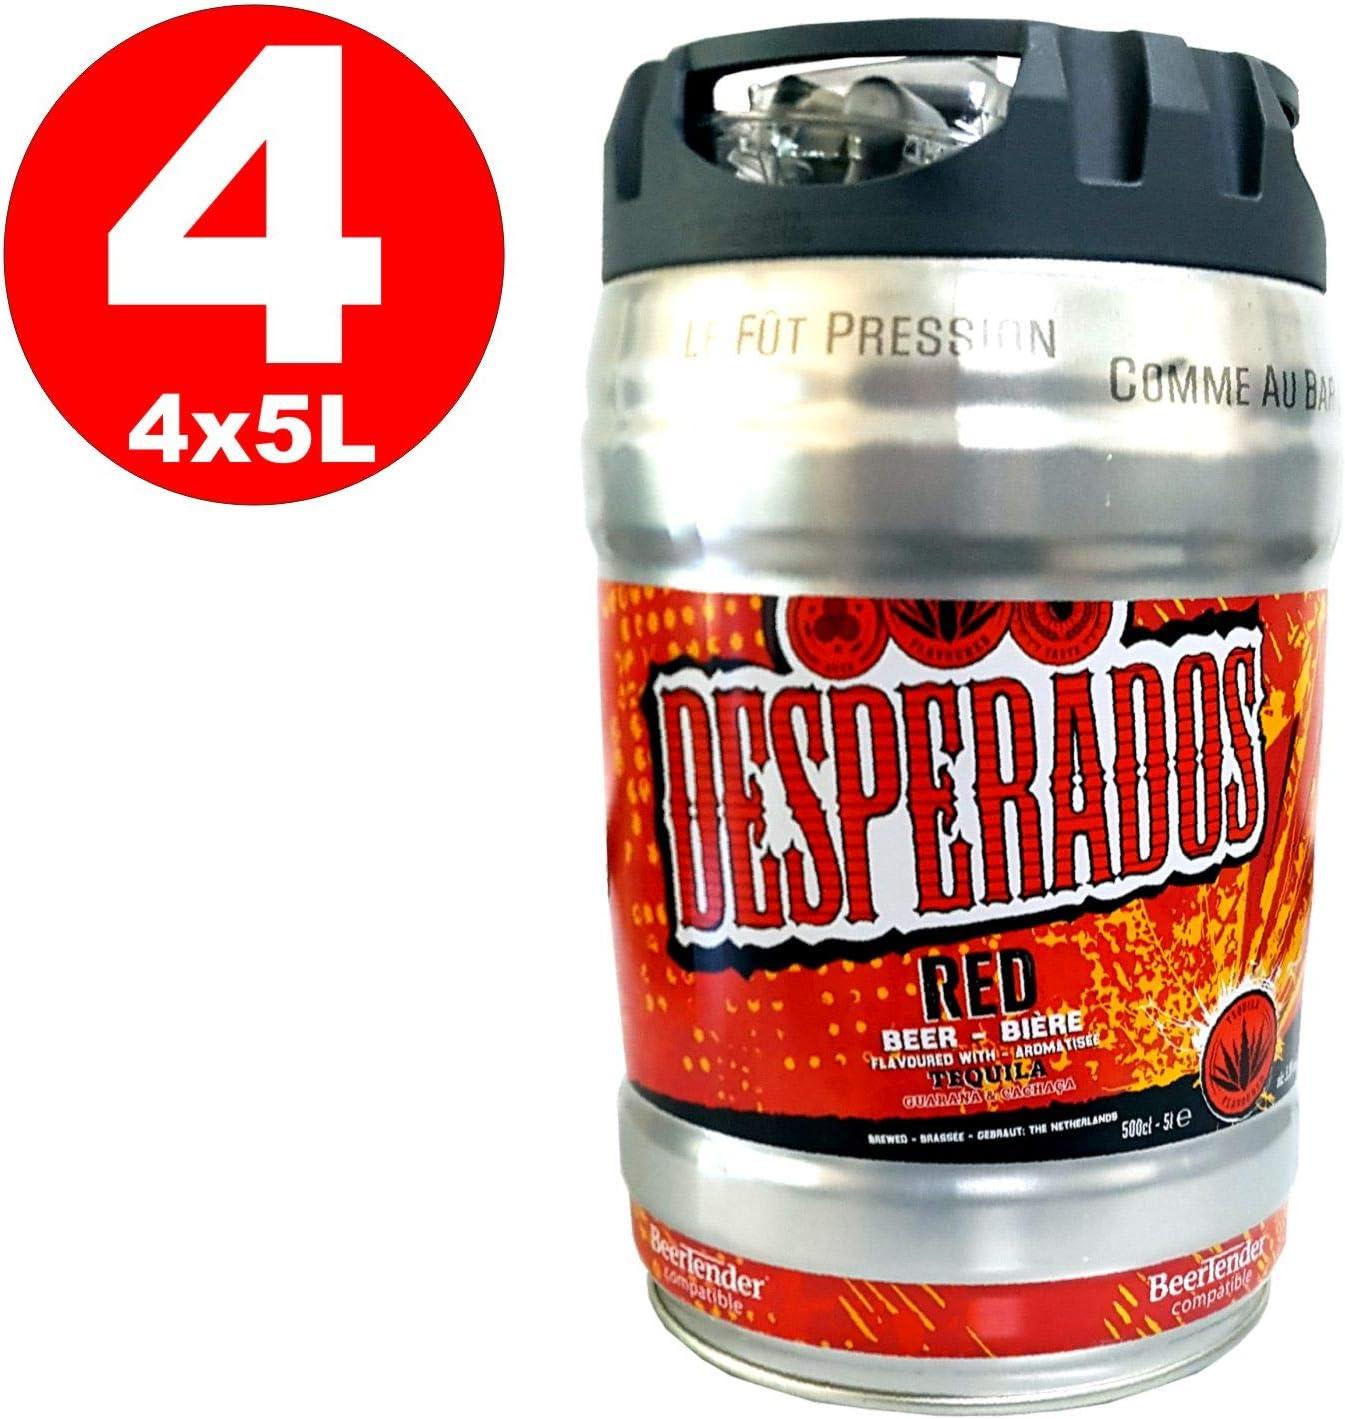 4 X Desperados Red Beer With Tequila Guarana Cachaca Party Barrel 5 Liter Barrel Incl Tap 5 9 Vol Amazon Co Uk Beer Wine Spirits